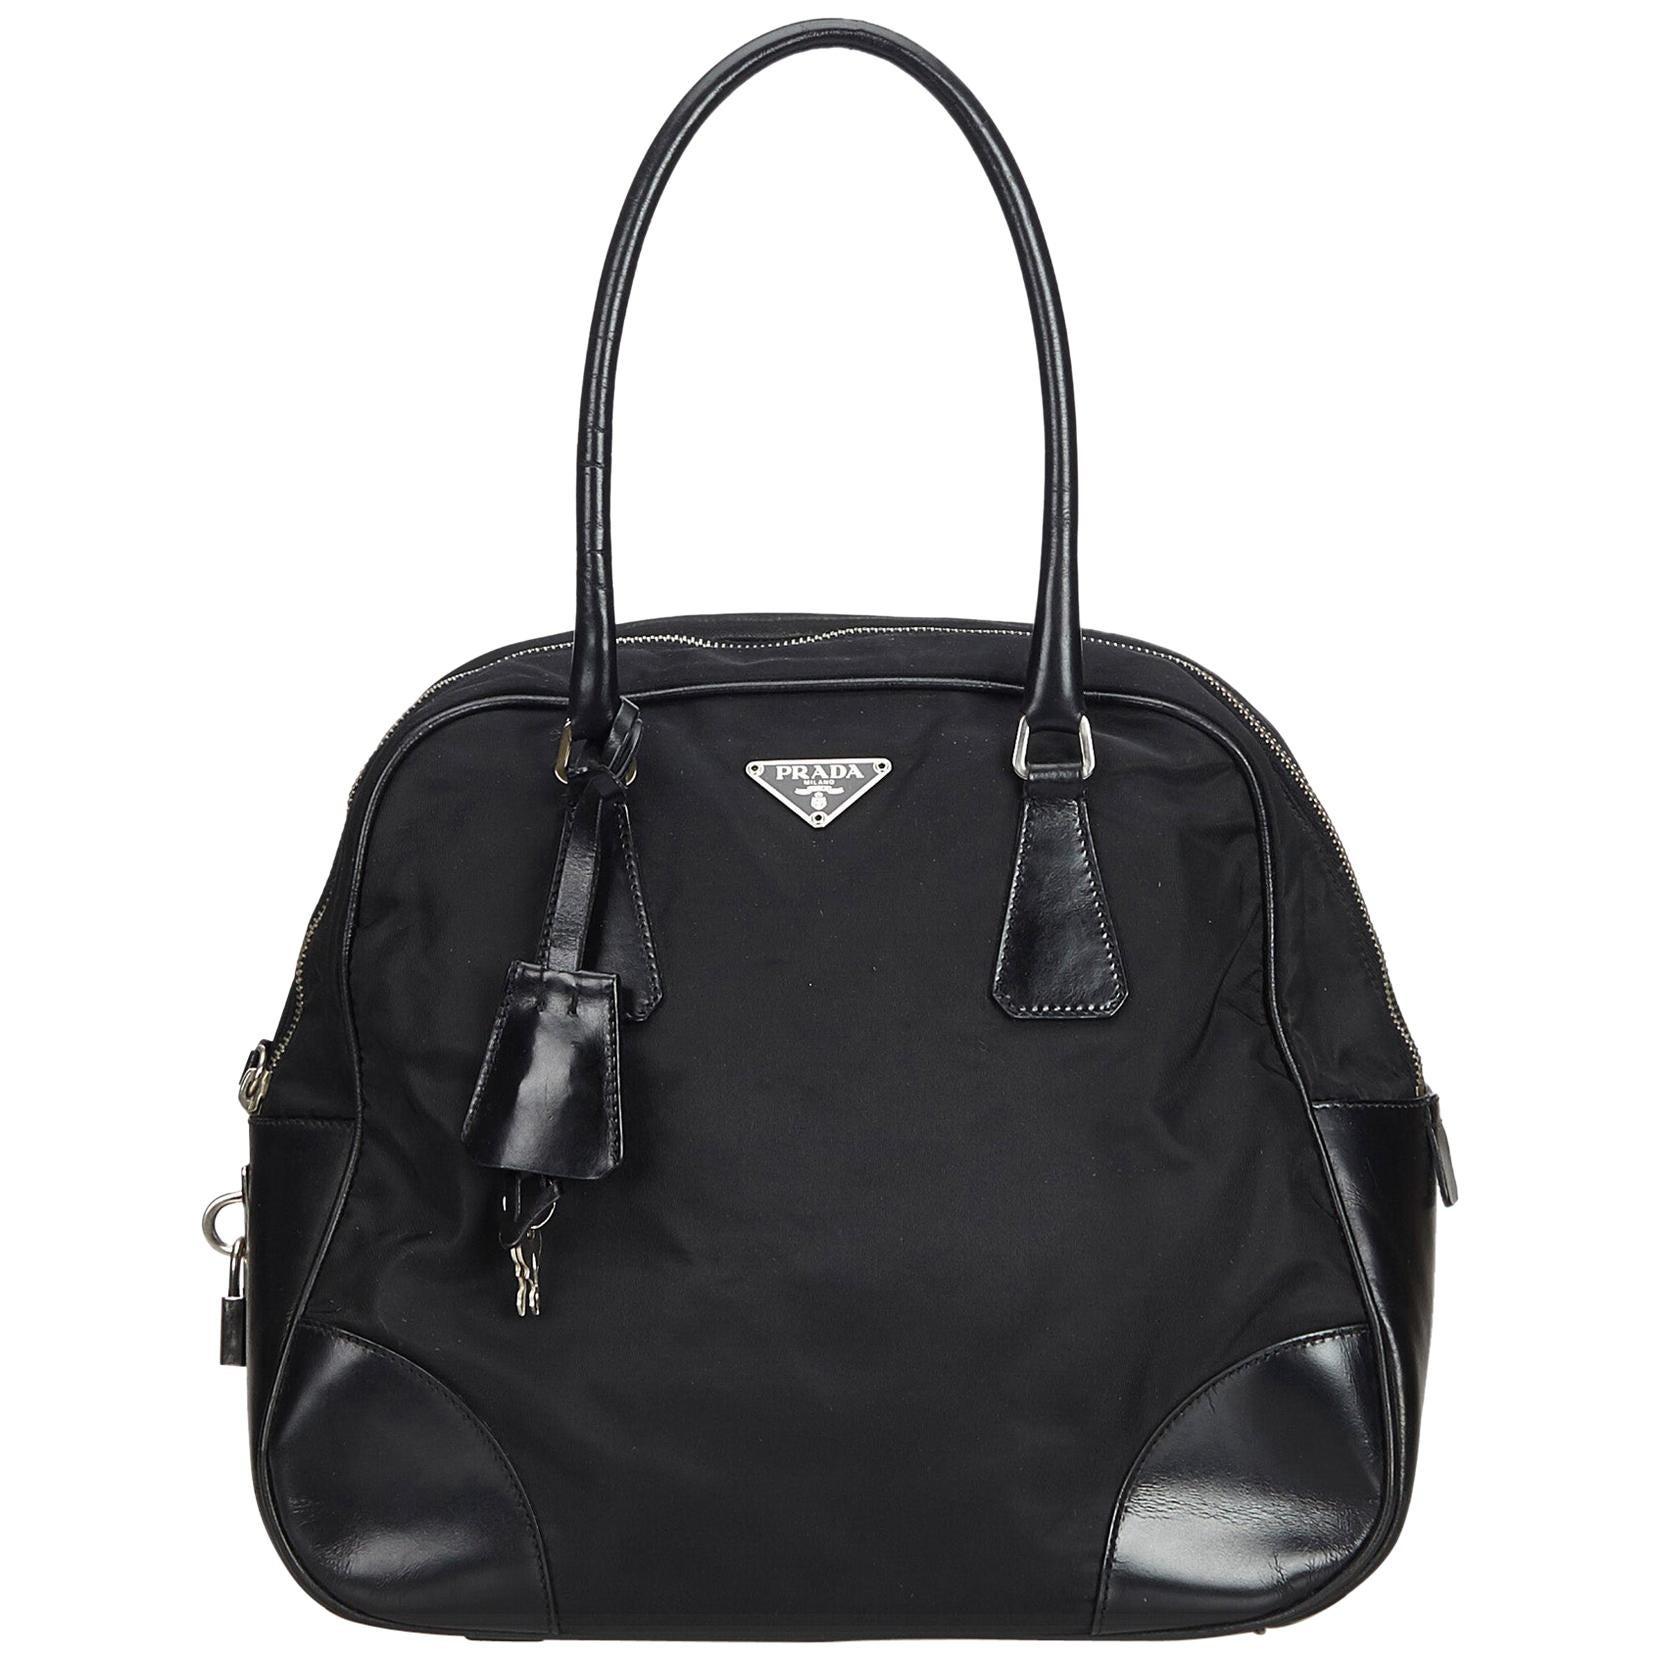 4a219bc20e Vintage Prada Handbags and Purses - 1,176 For Sale at 1stdibs